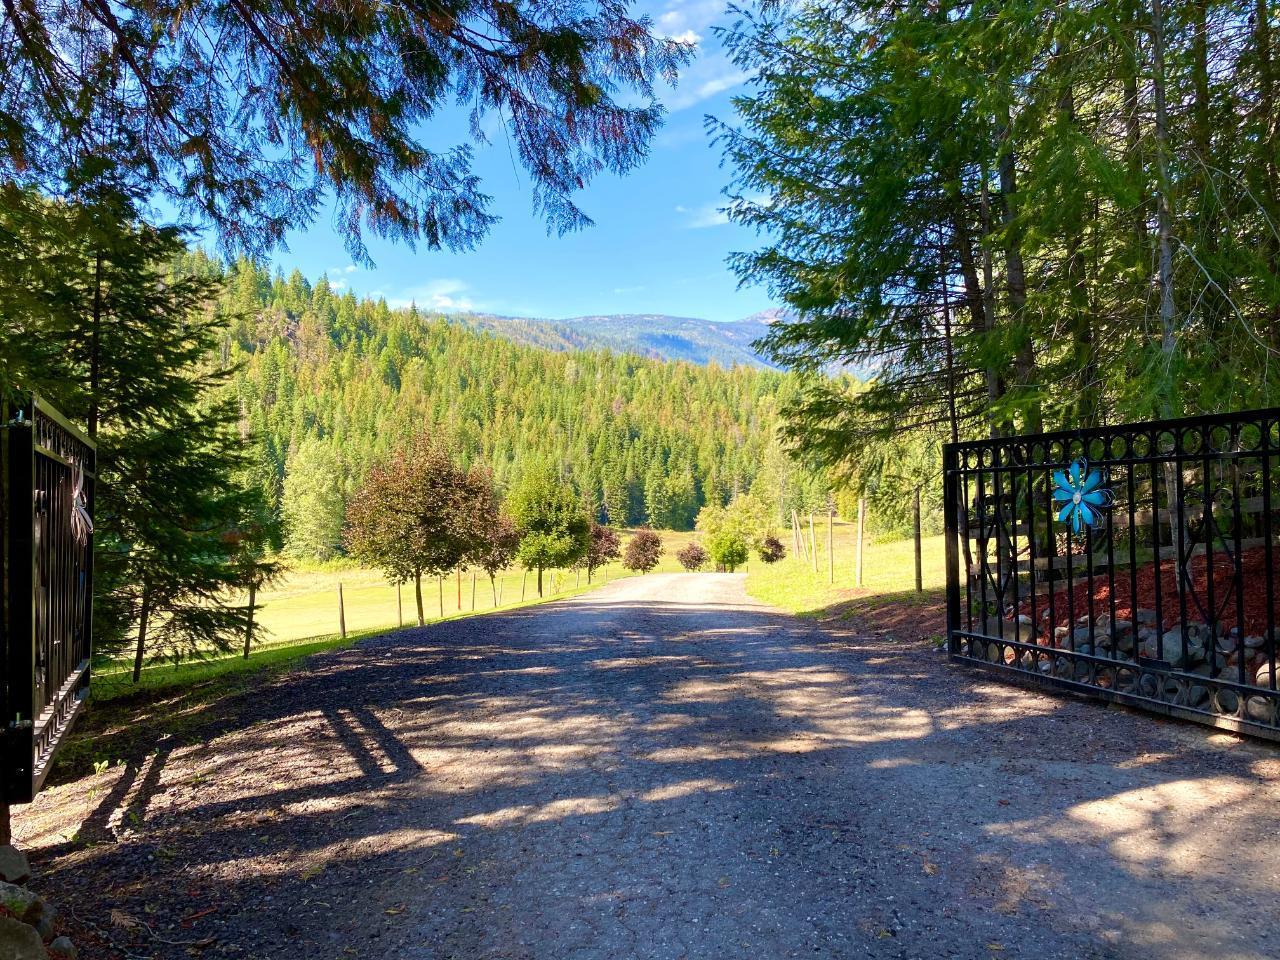 2505 Barley Road, Rossland, British Columbia  V0G 1Y0 - Photo 4 - 2461148